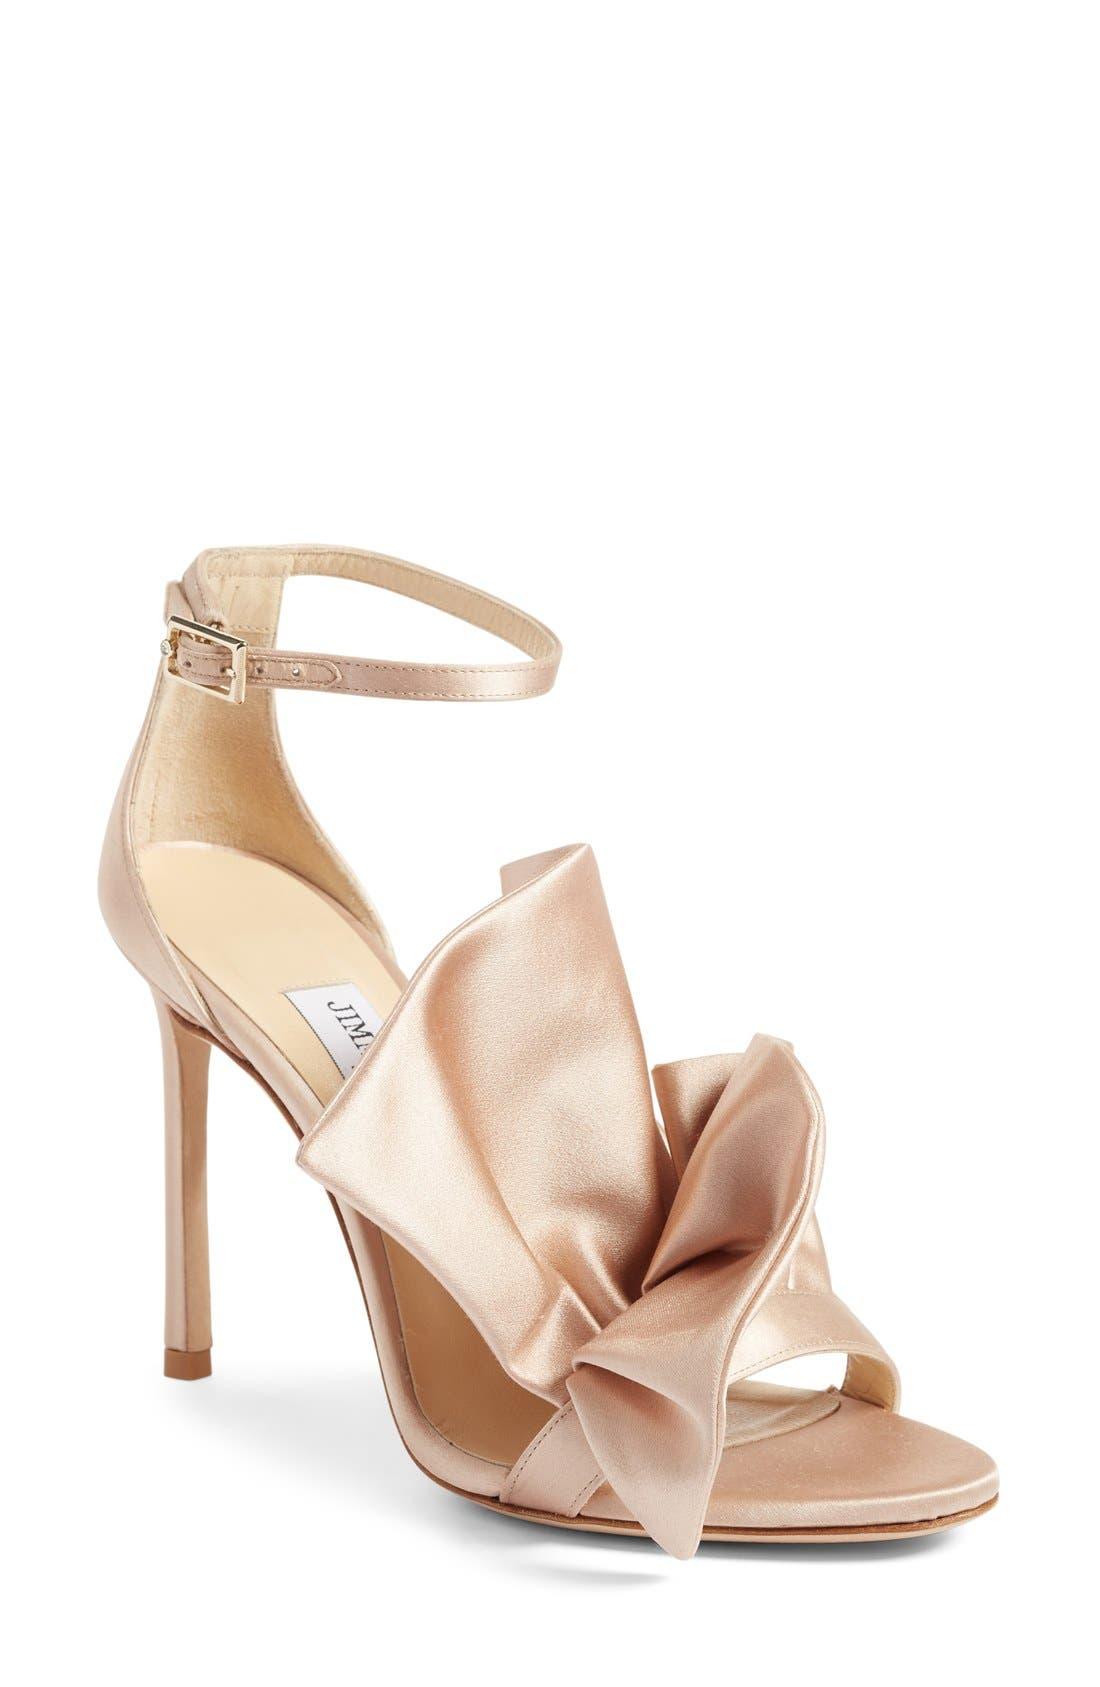 Main Image - Jimmy Choo Kami Ruffle Sandal (Women)